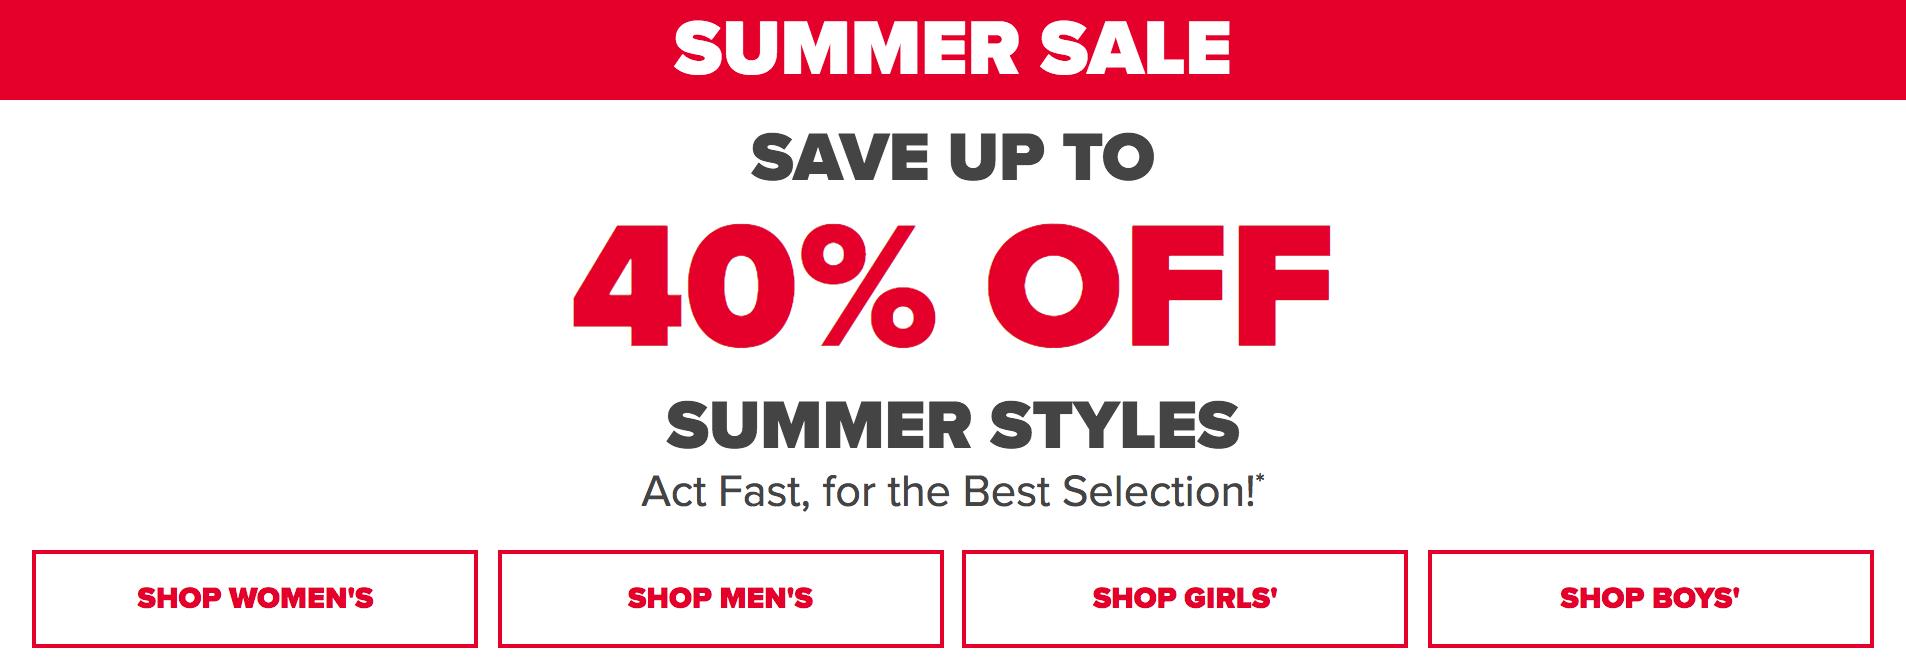 Crocs Crocs: Summer Sale up to 40% off summer styles